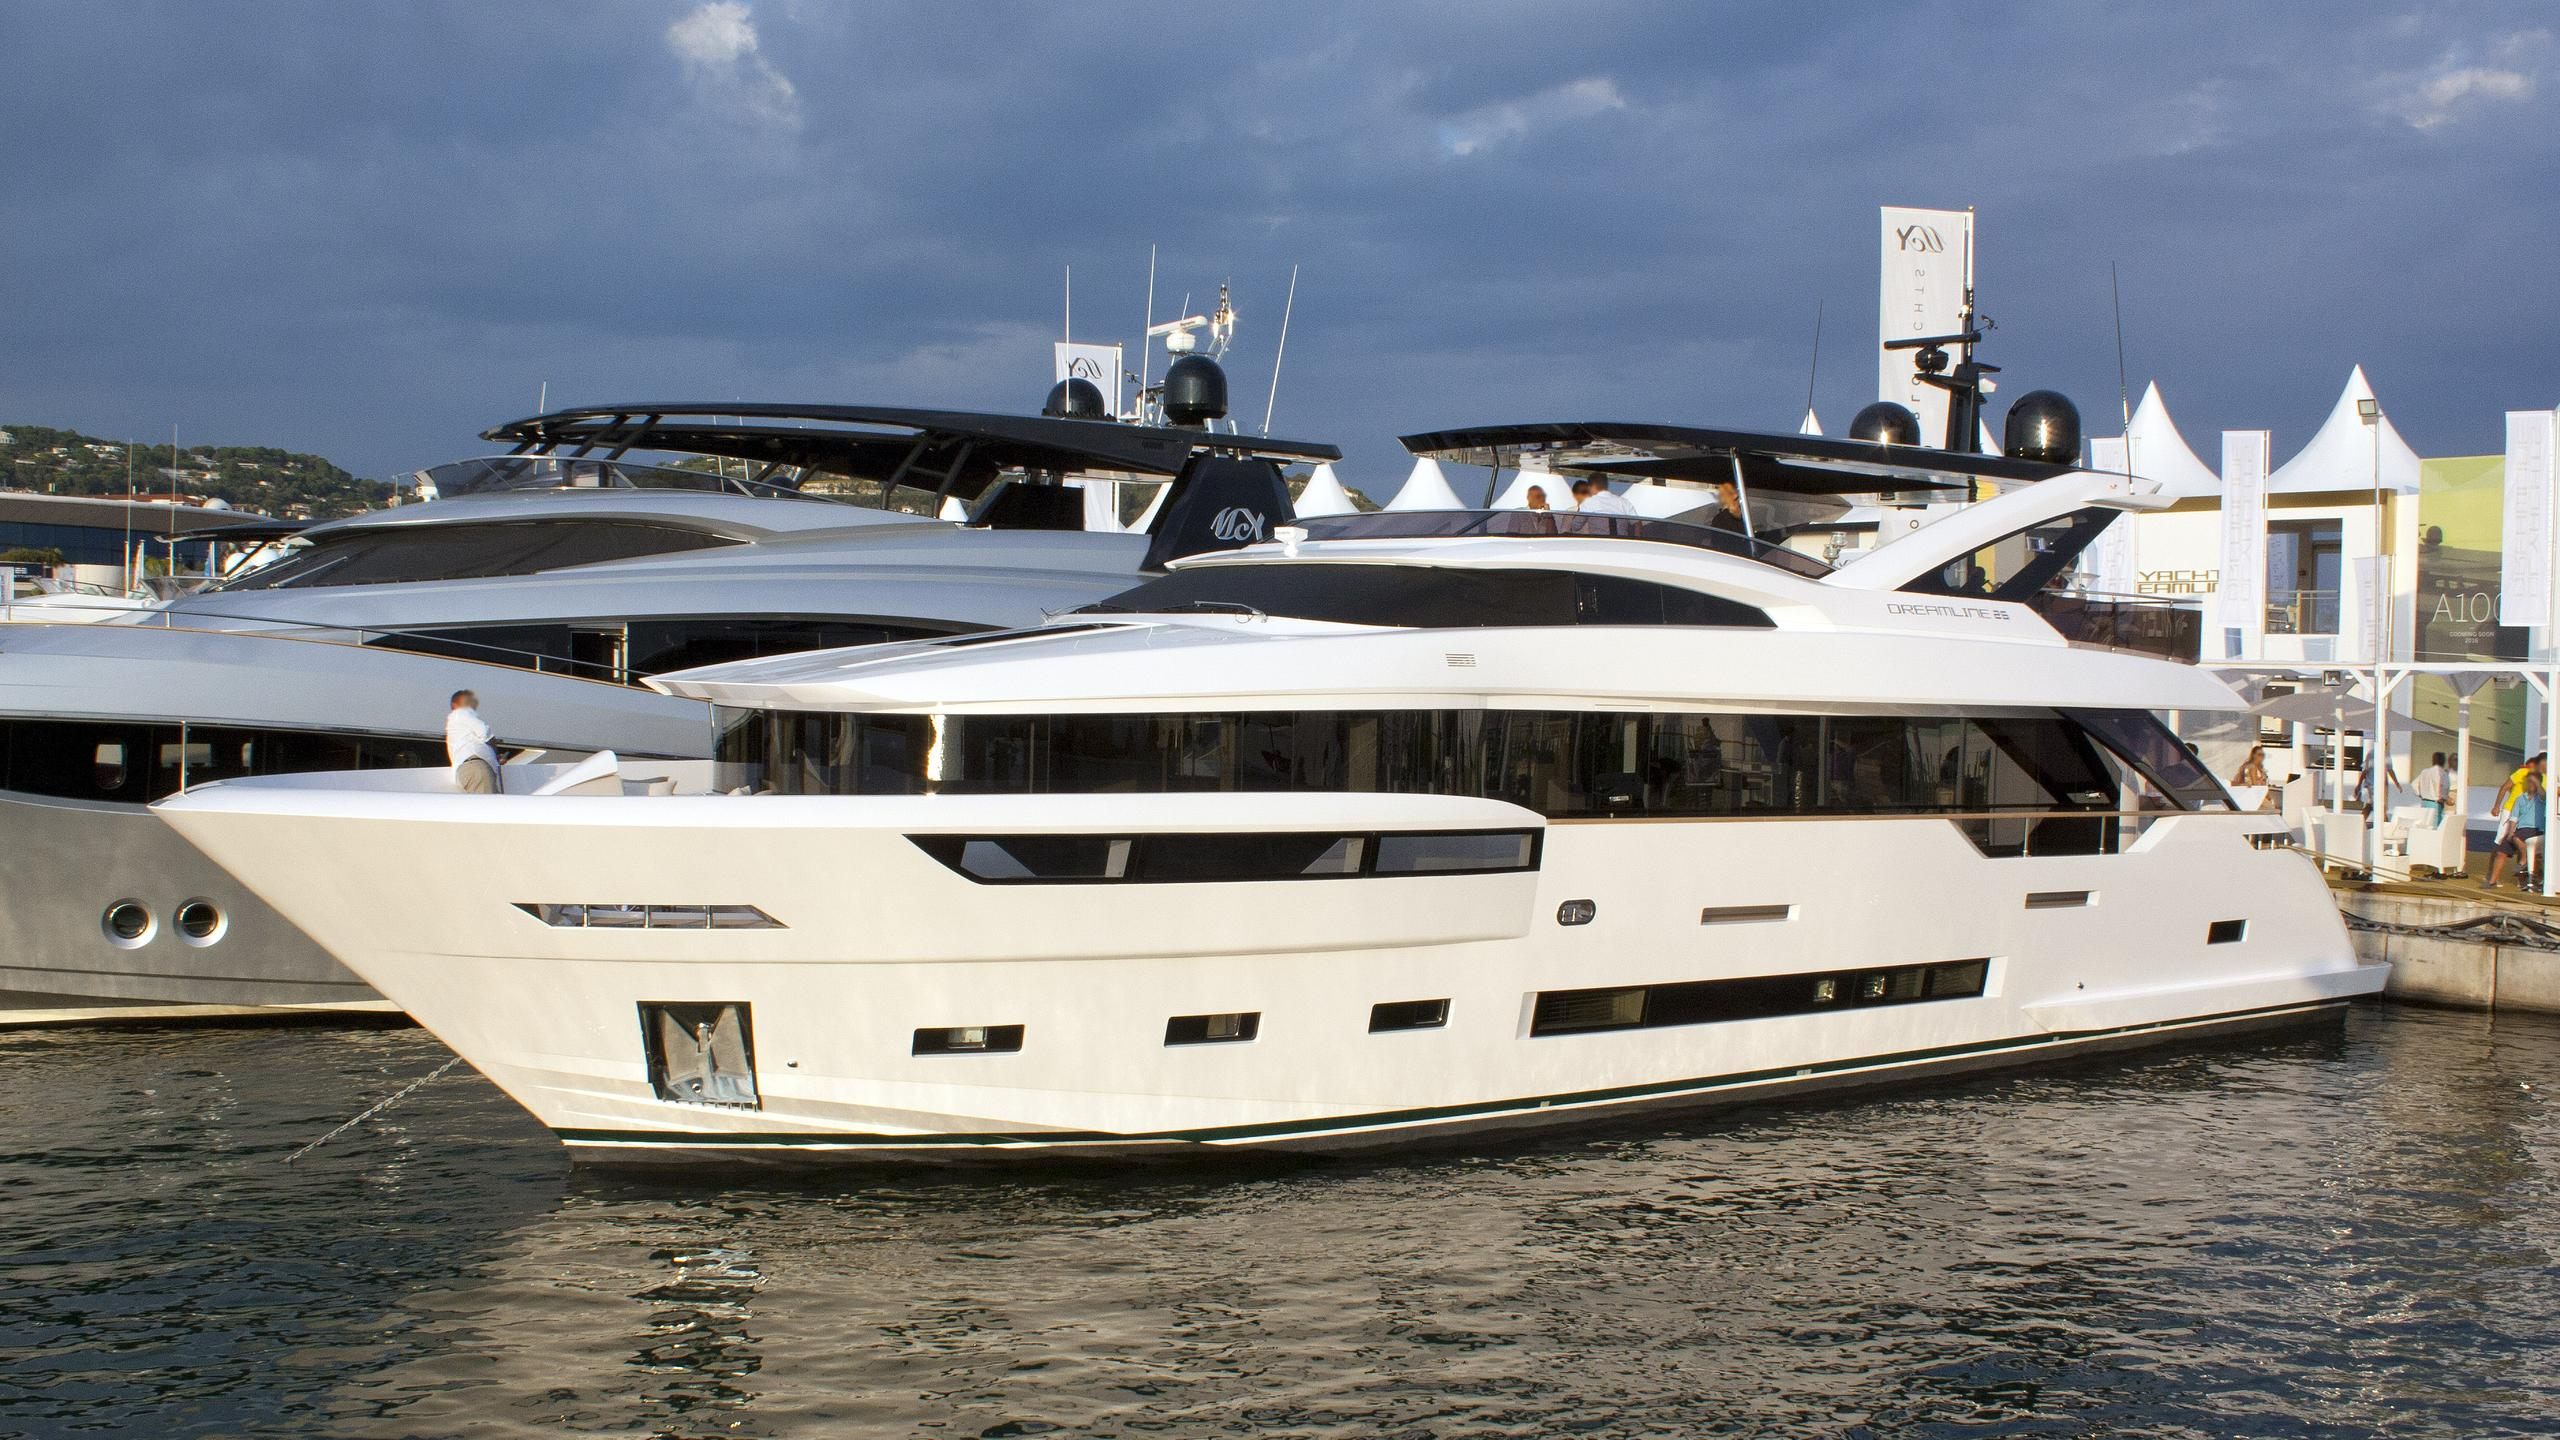 7 seconds motor yacht dl dreamline 2015 26m front profile